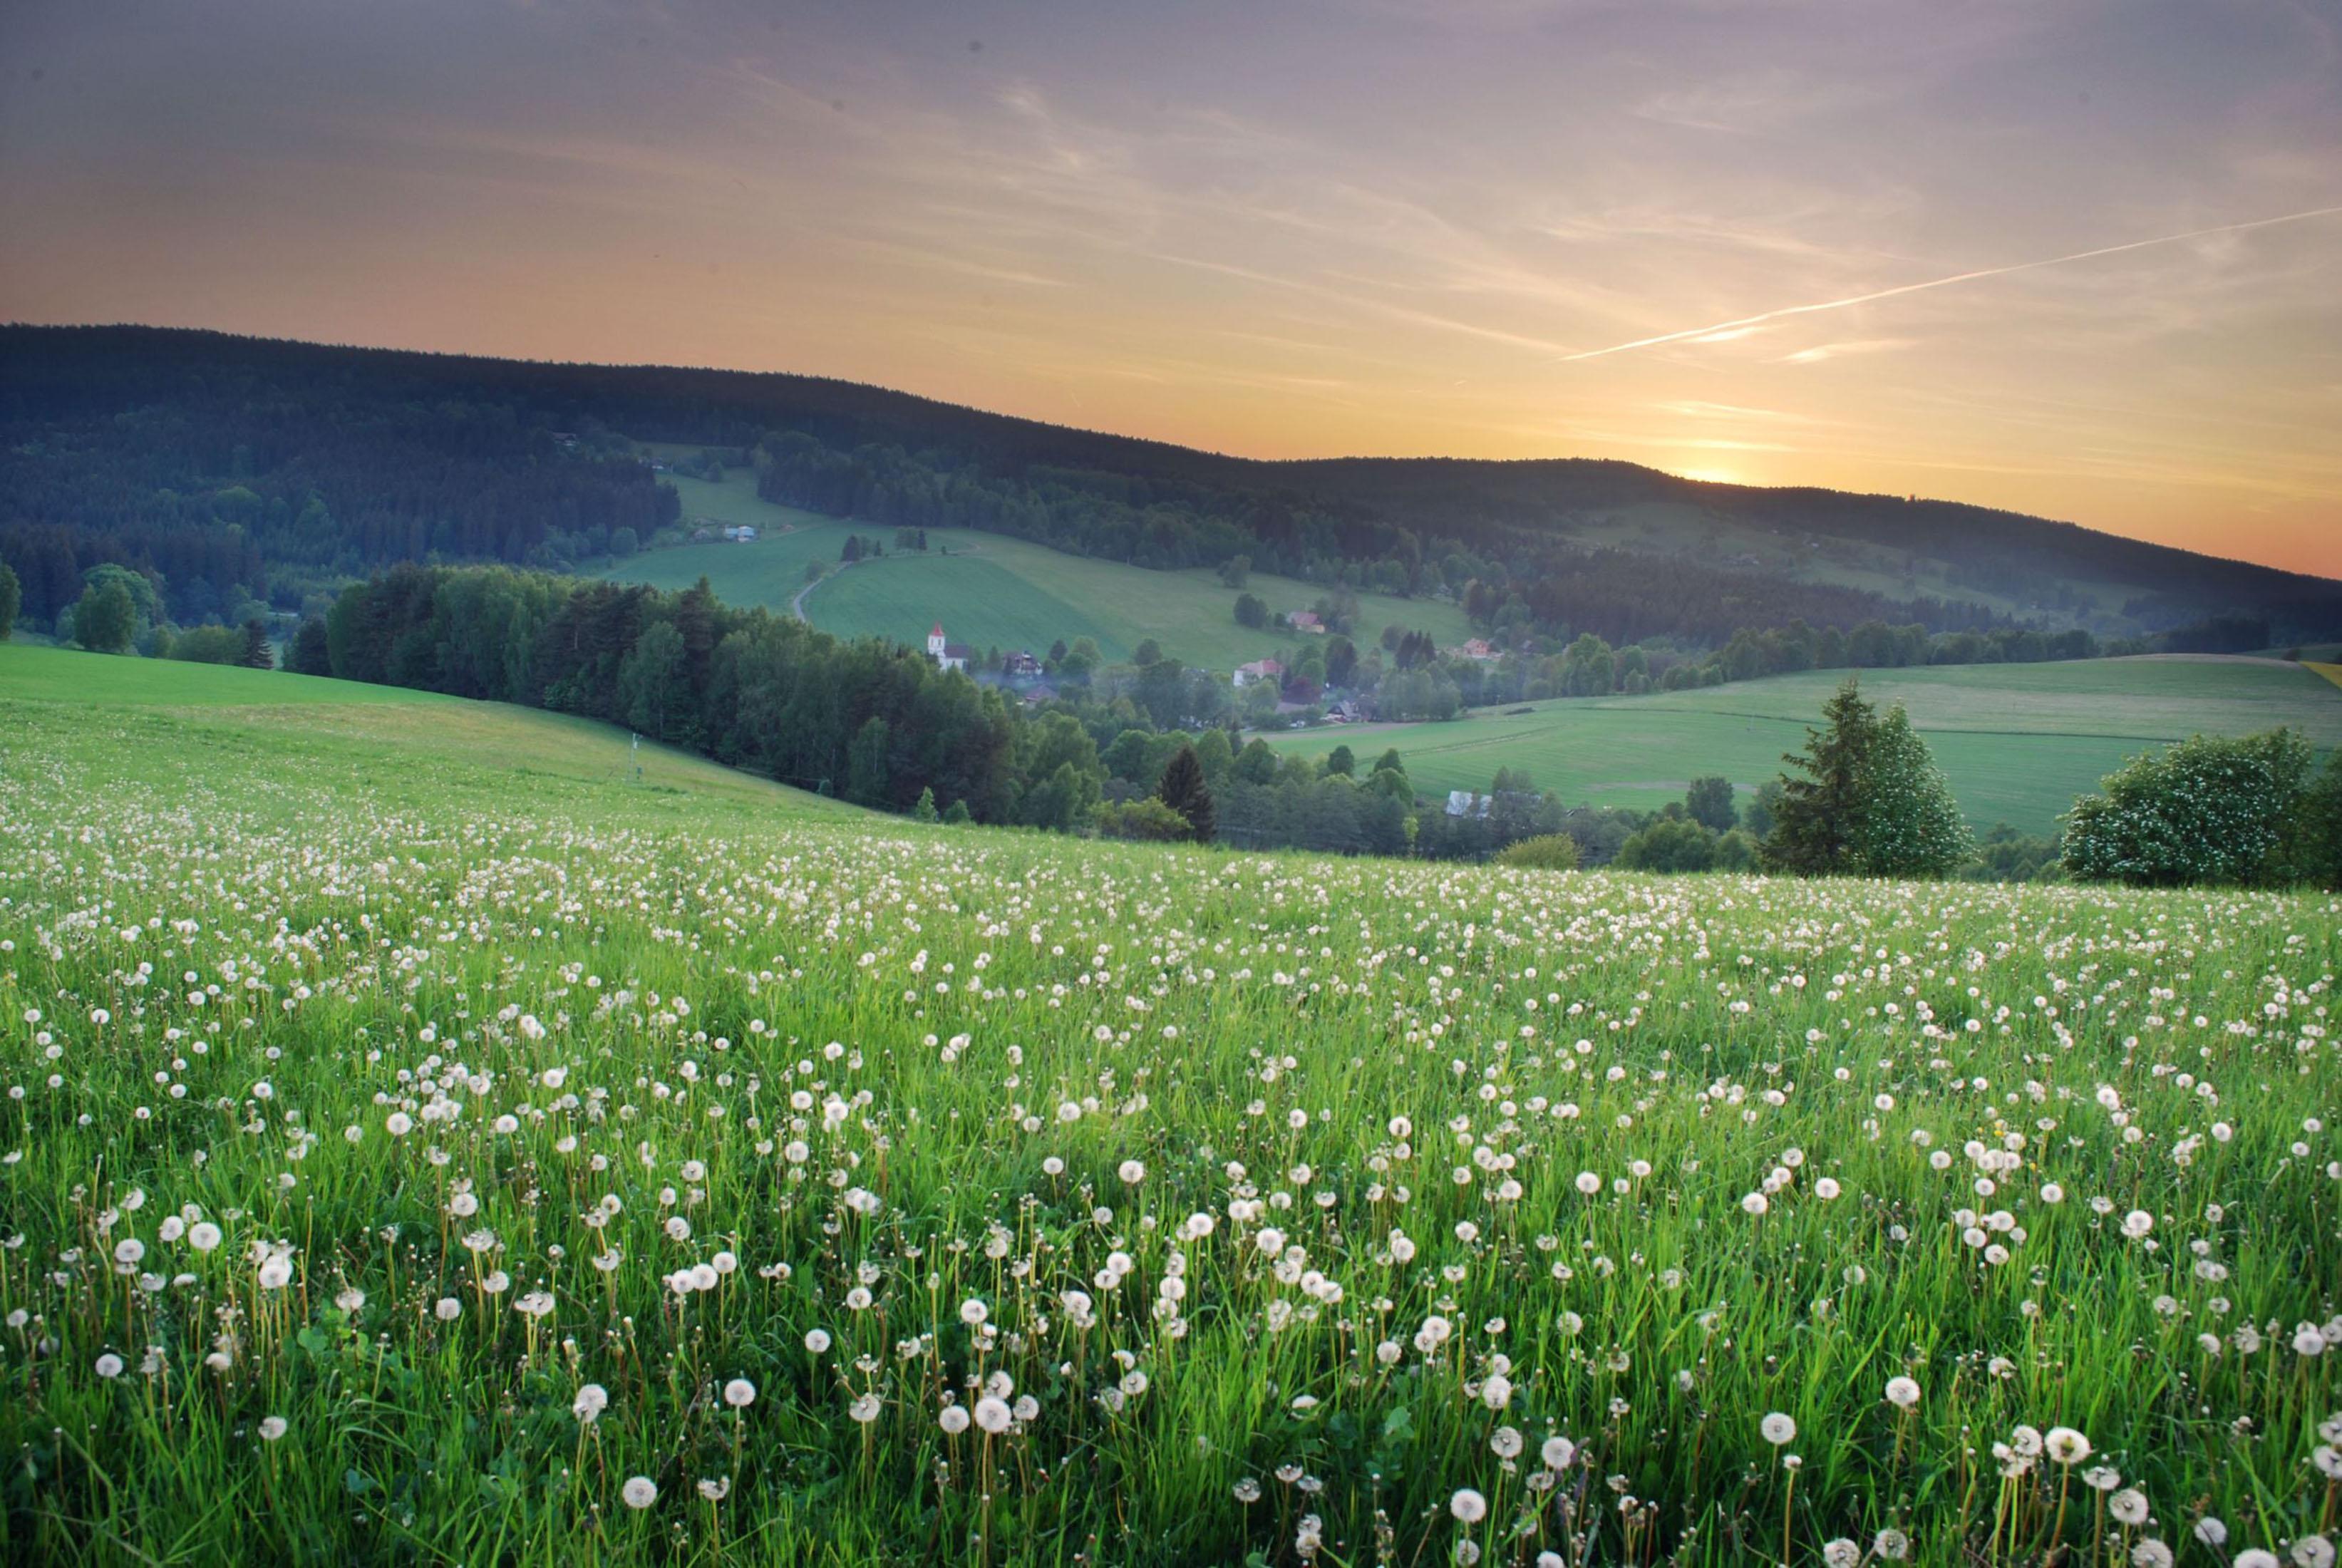 ceska-krajina-01-louka-hory_4866475